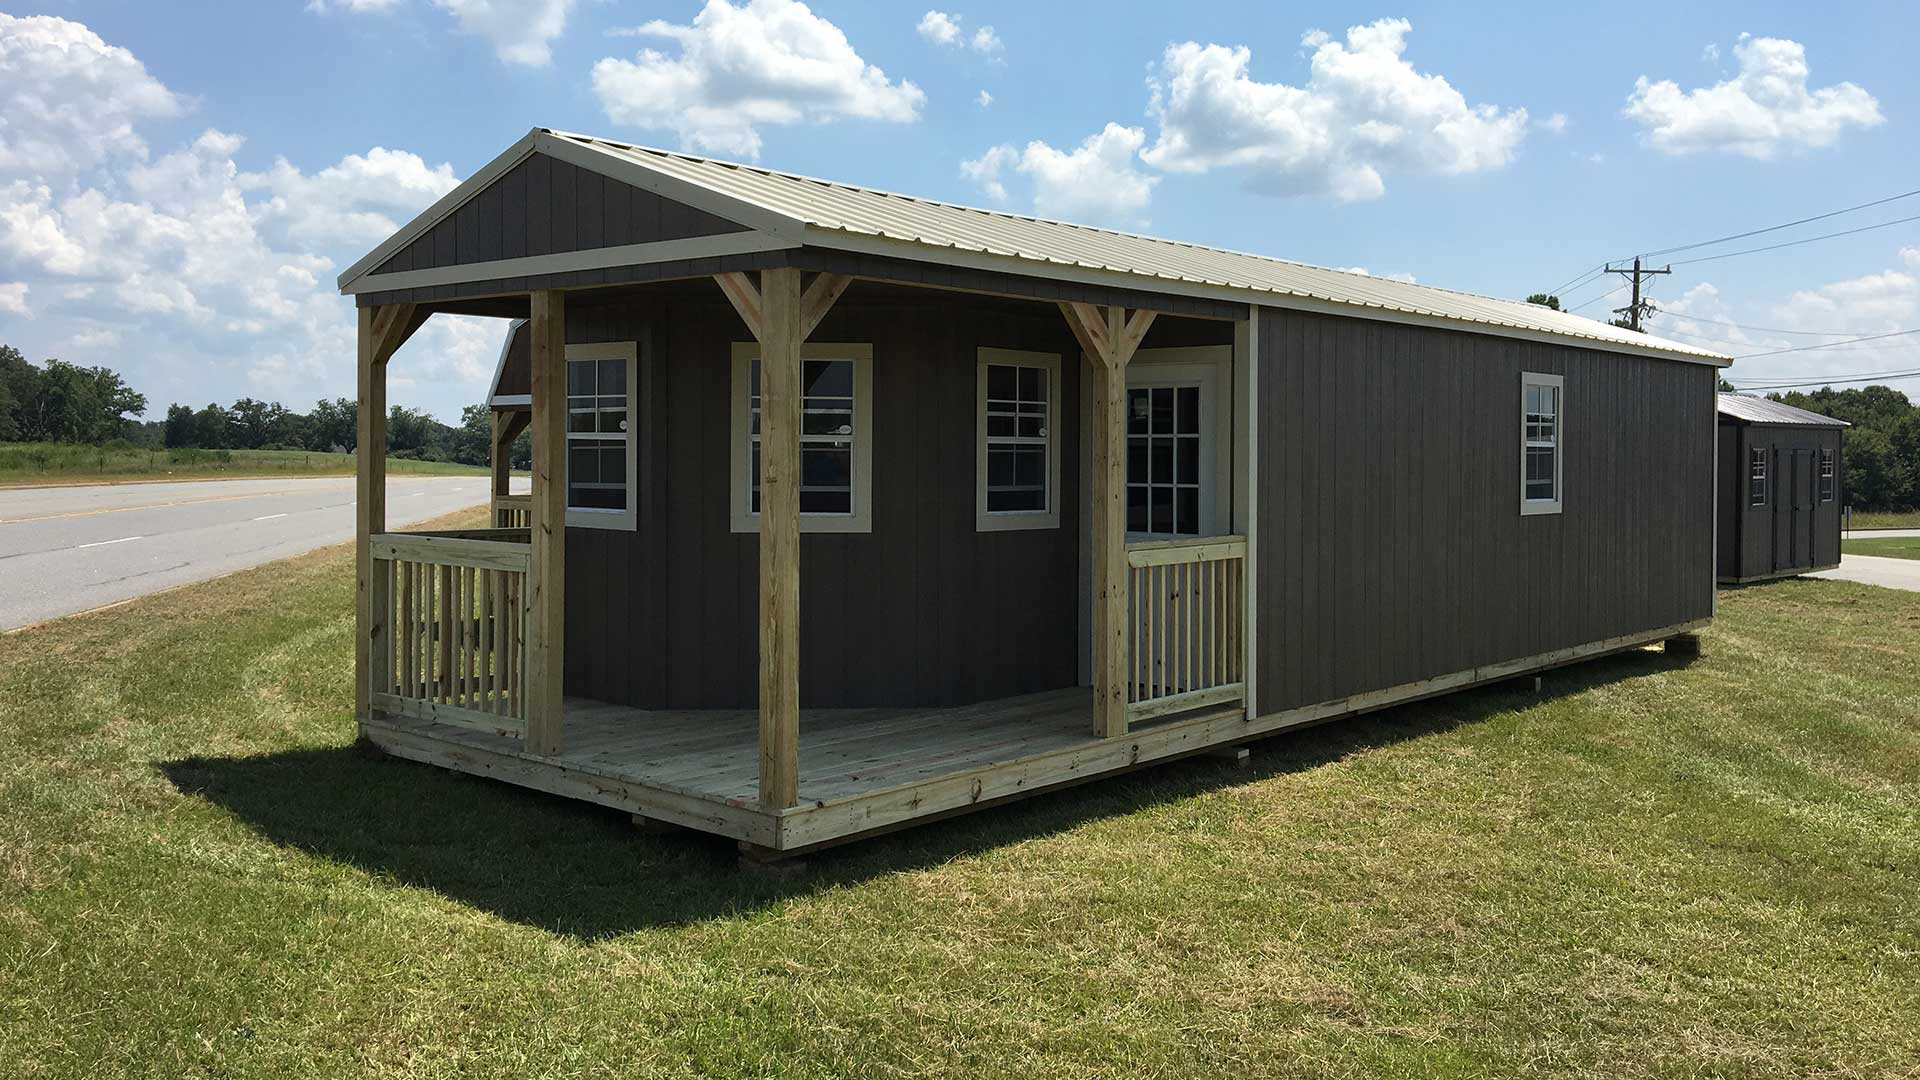 Smart Shed Portable Storage Buildings, Portable Sheds and Smart Sheds